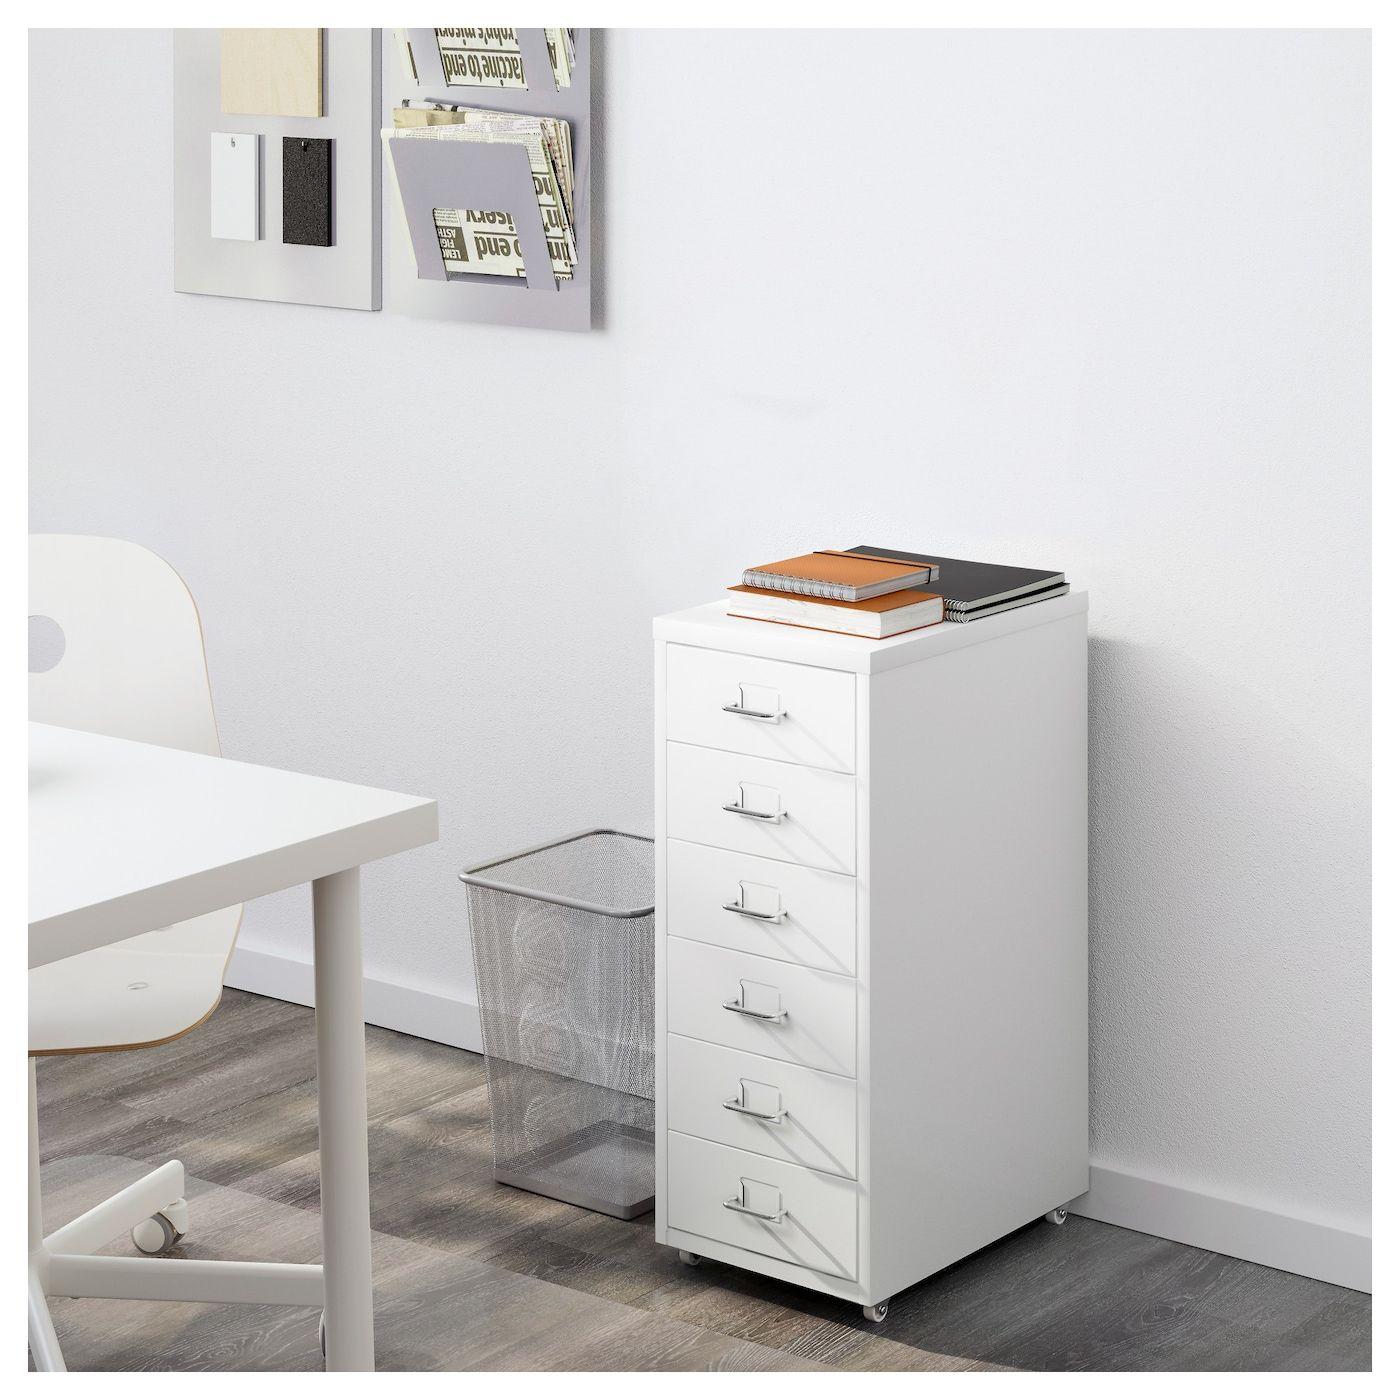 Helmer Cassettiera Con Rotelle.Helmer Cassettiera Con Rotelle Bianco 28x69 Cm Ikea It Drawer Unit Ikea Drawers